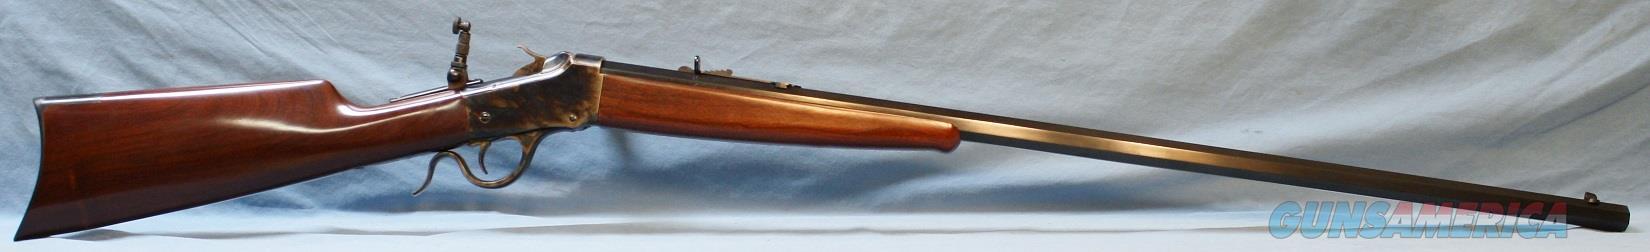 Cimarron 1885 Low Wall Single Shot Sporting Rifle, made by Uberti, 38 WCF (38-40)  Guns > Rifles > Uberti Rifles > Single Shot